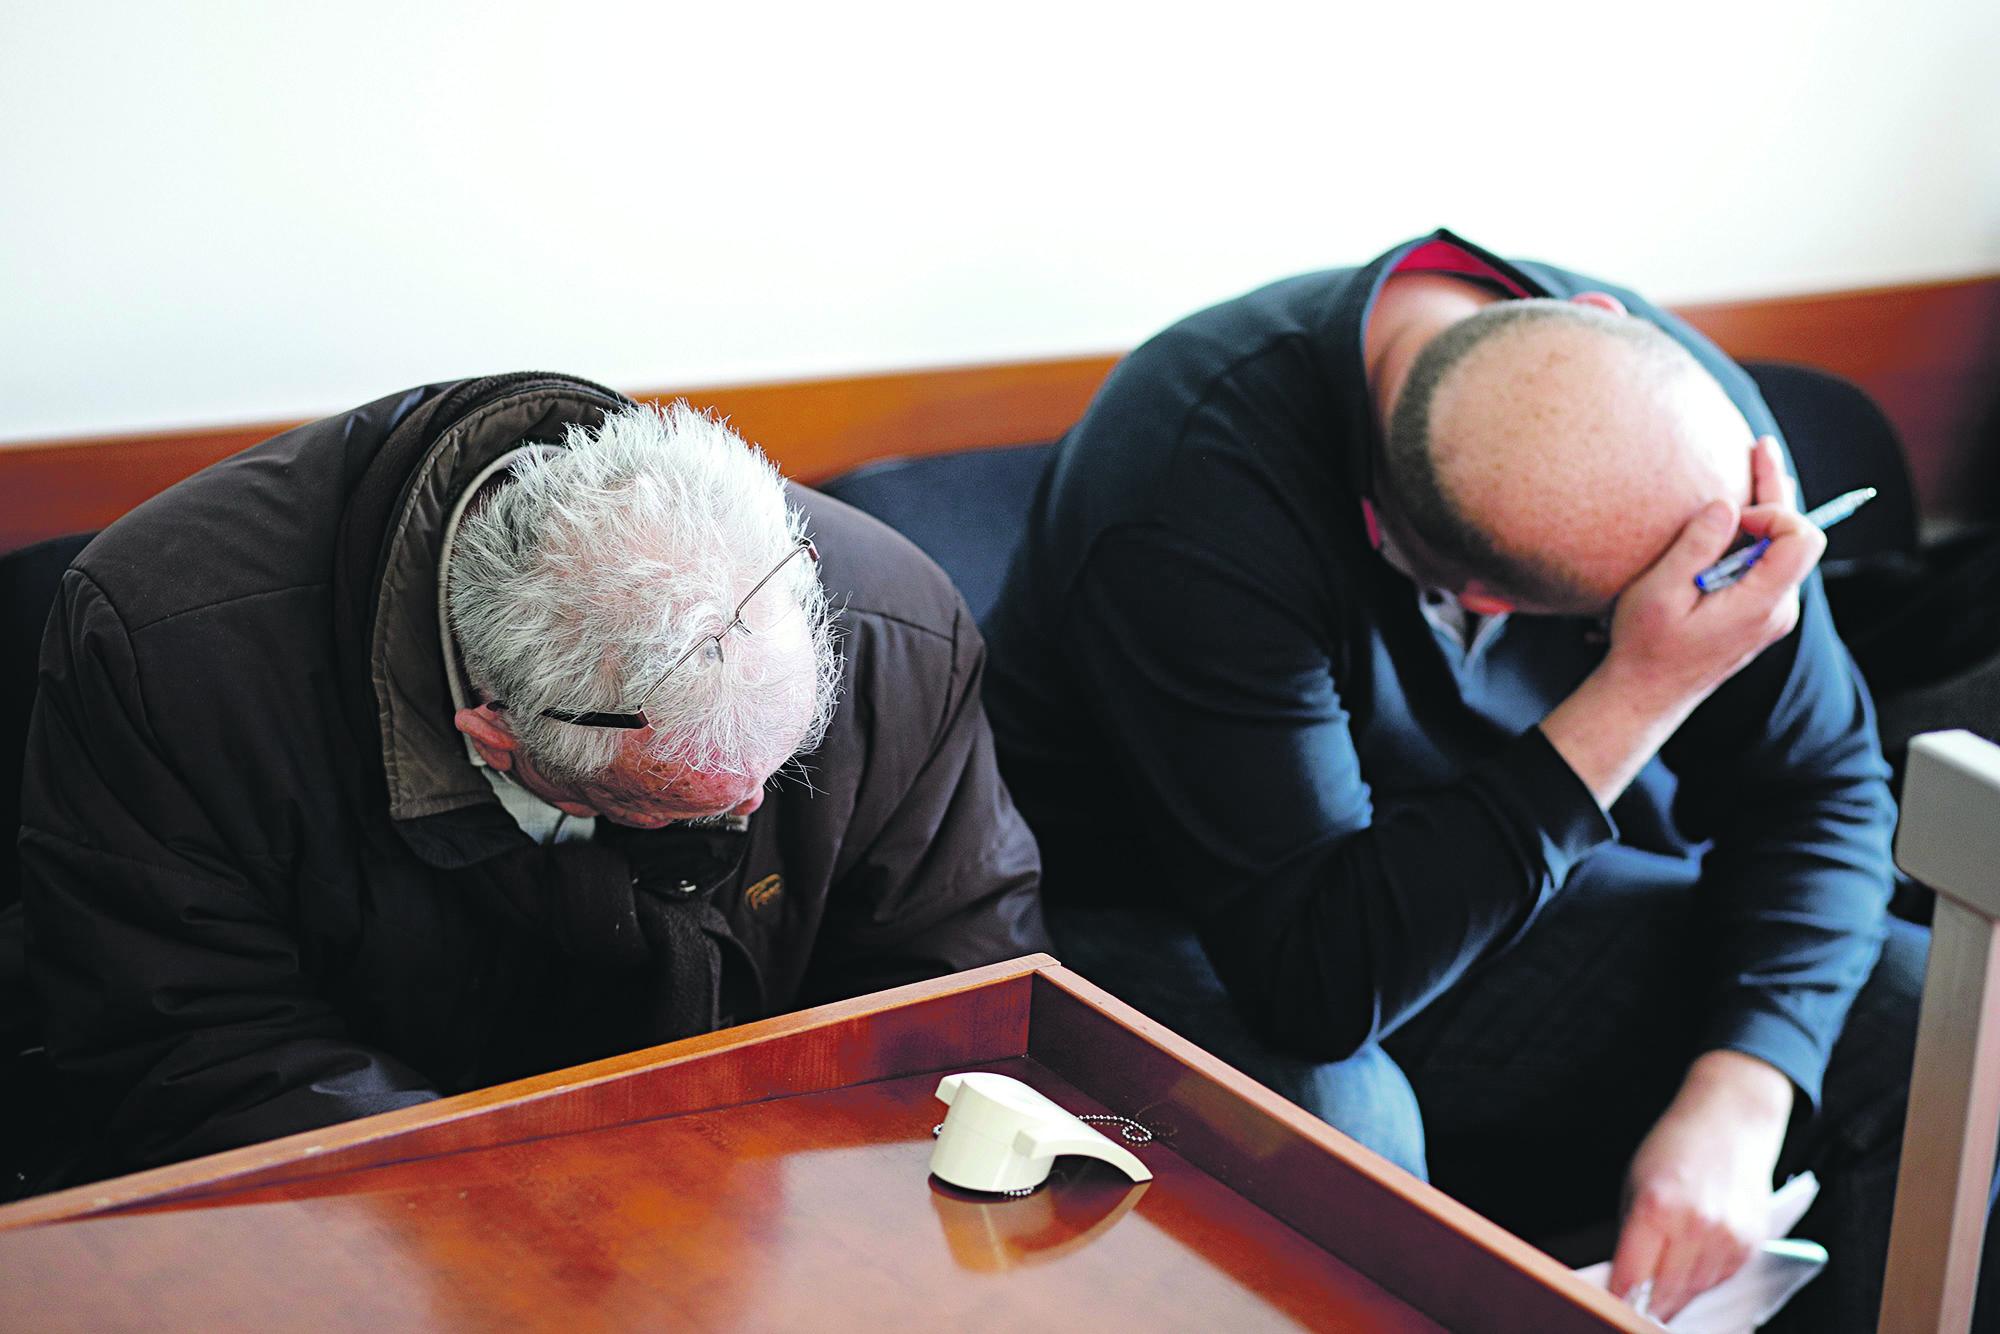 Na fotografiji: Branislav Brozicevic i Antun Milat na Opcinskom kaznenom sudu, 23.1.2018.